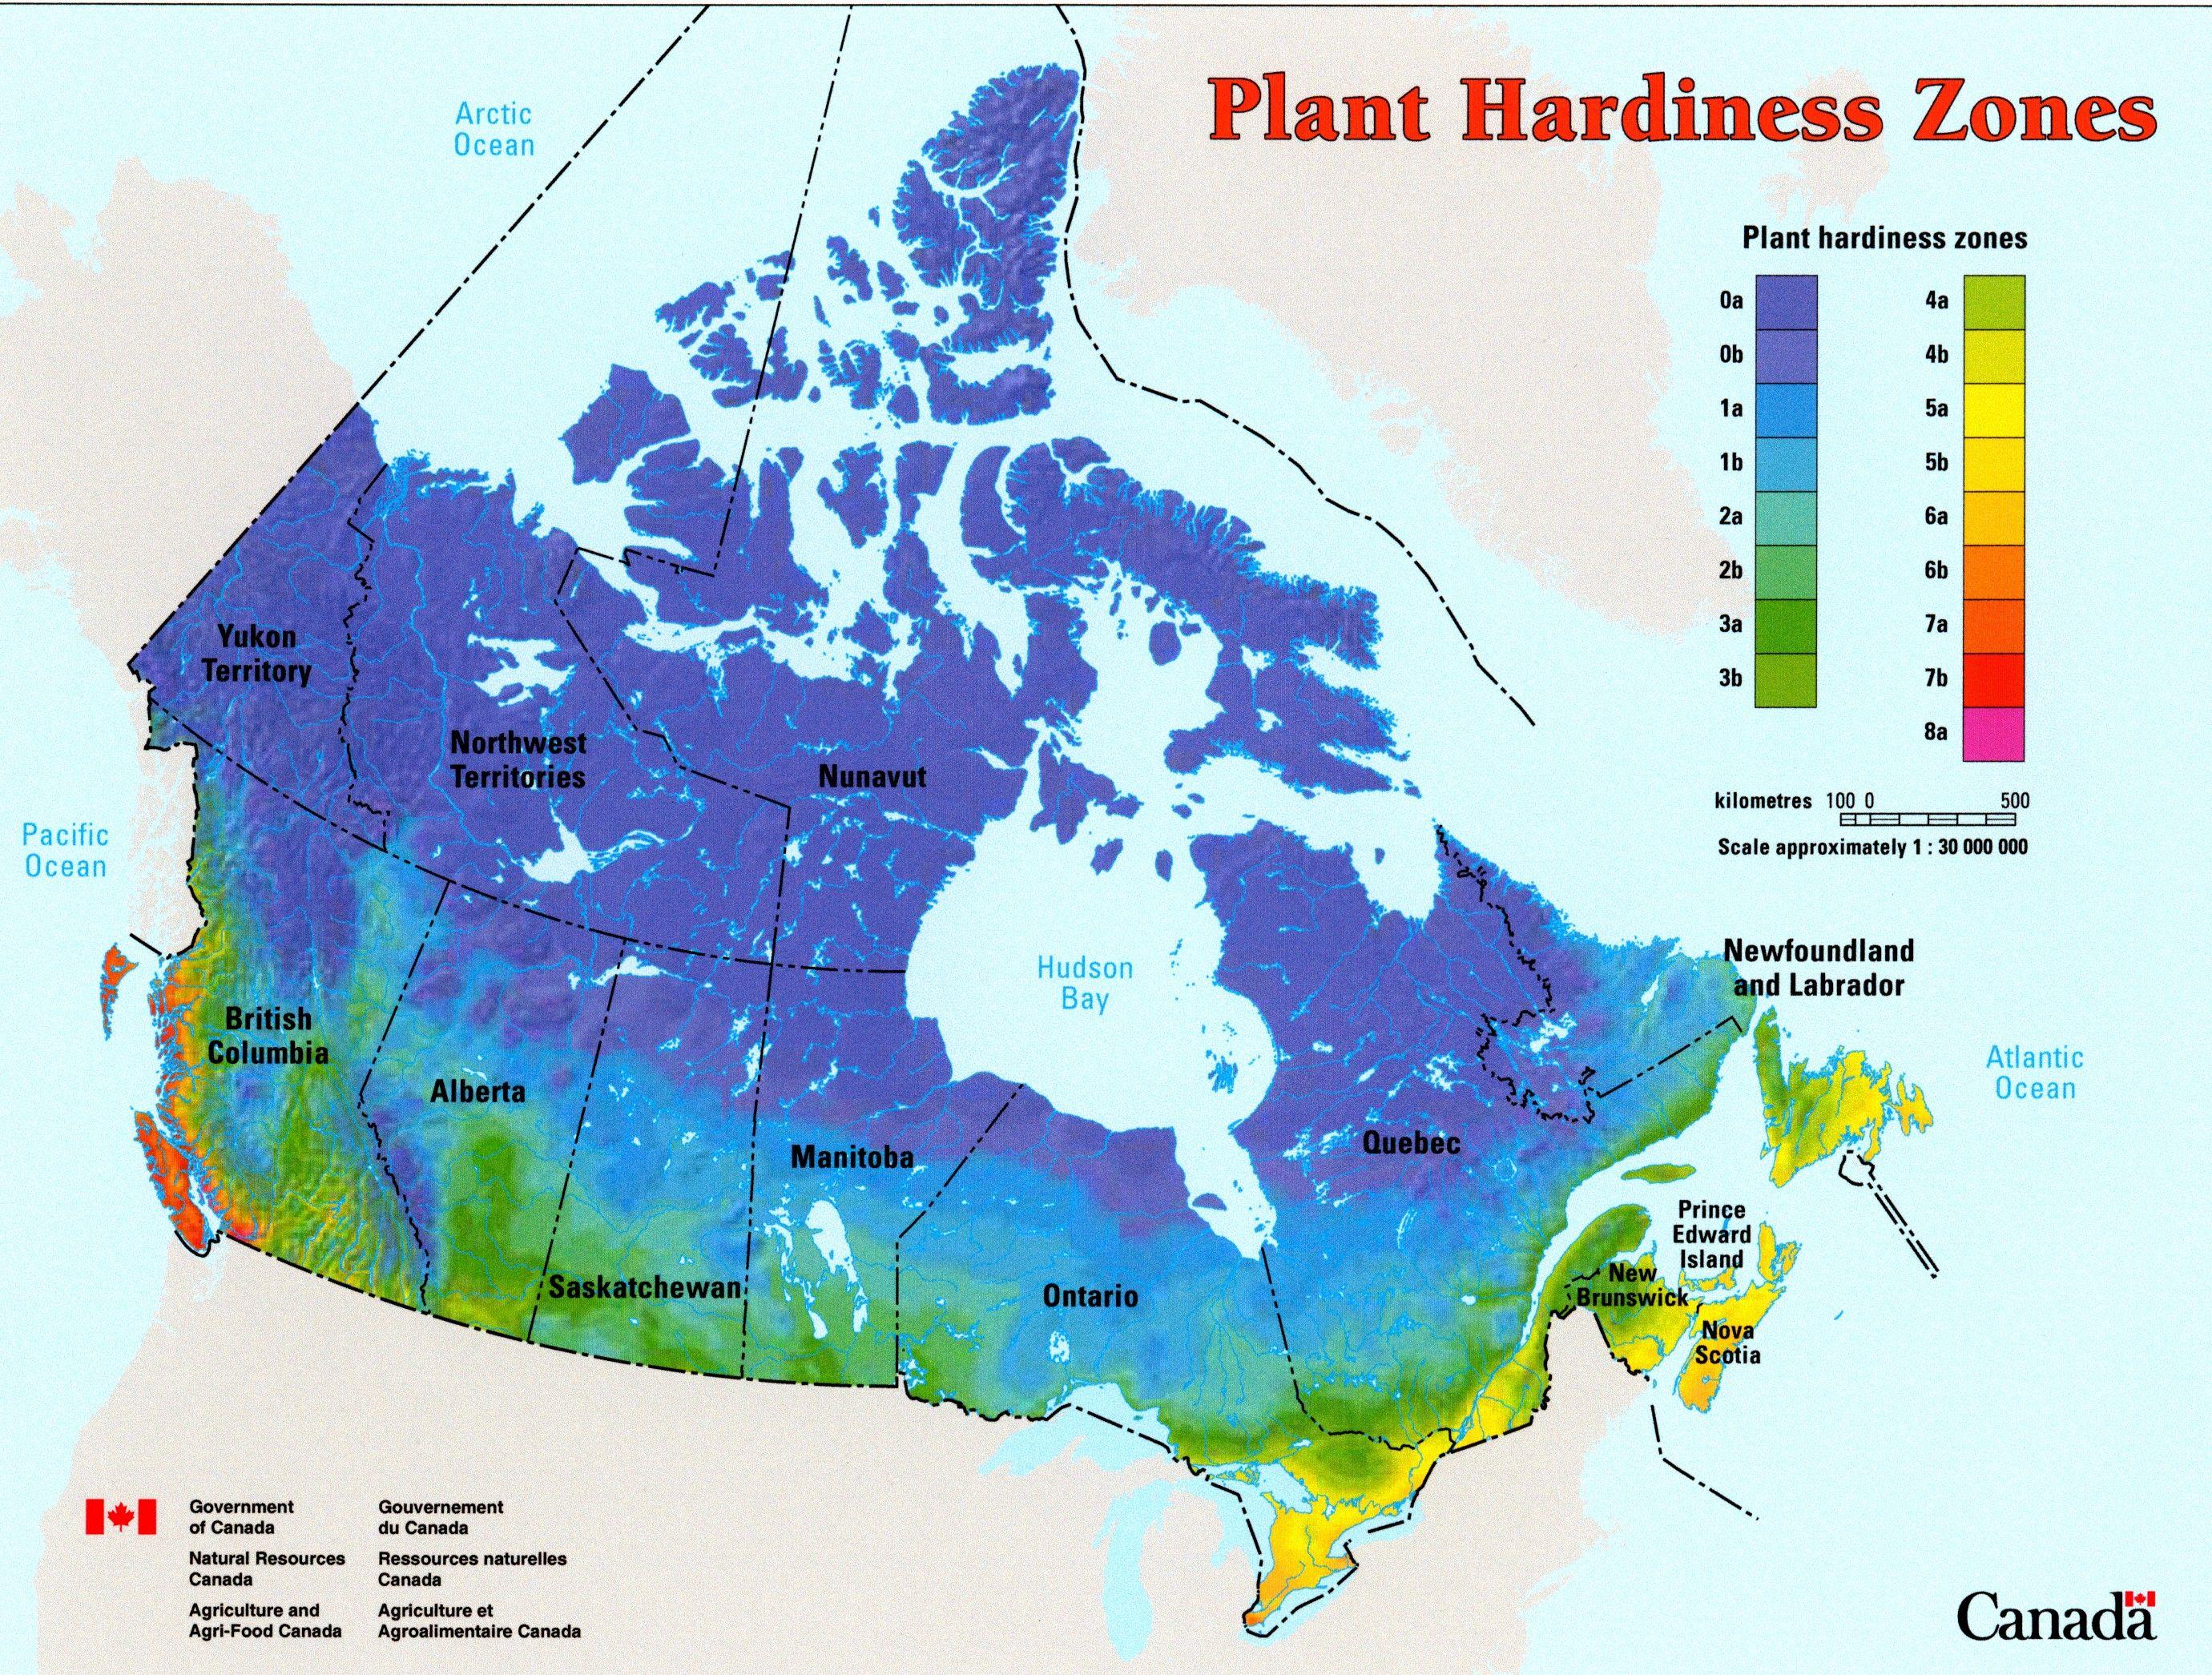 443ccc14a31028e1f311bc5ead8d3681 - What Zone Is Ottawa In For Gardening